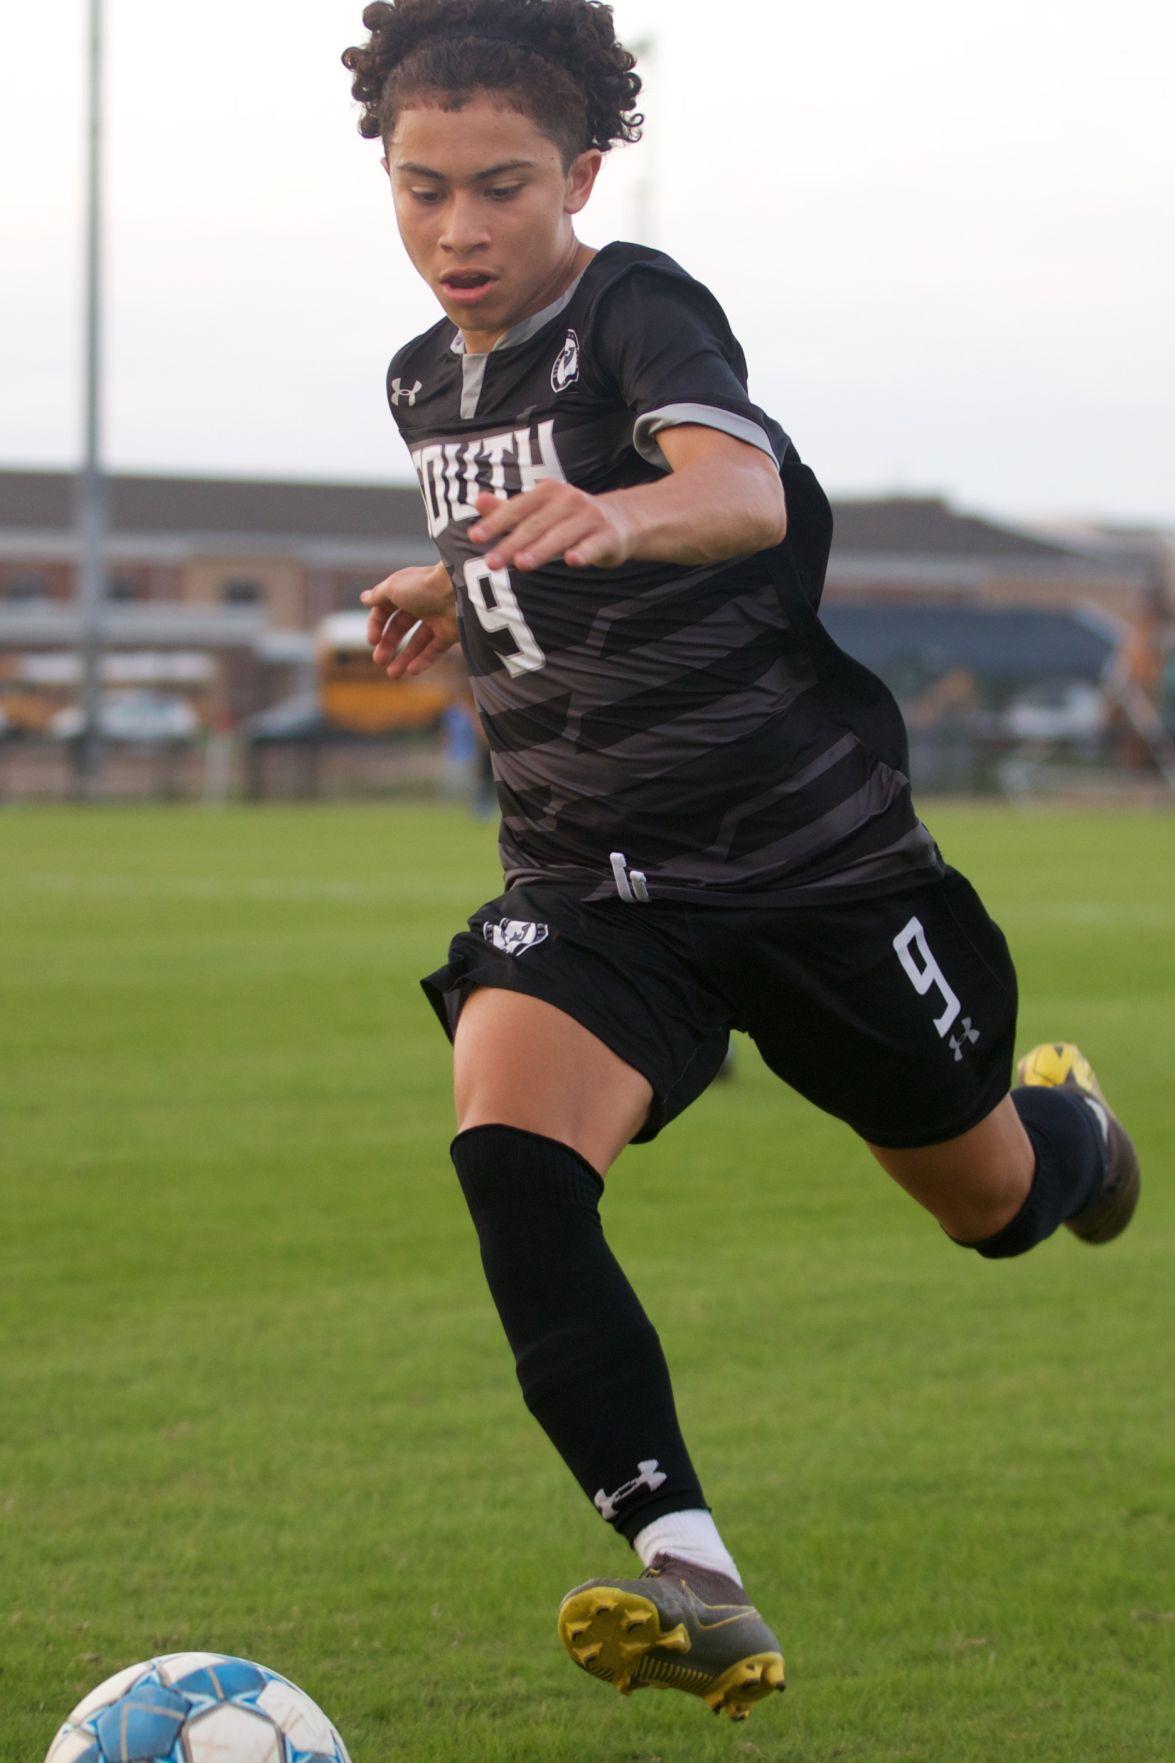 211013-sports-South Warren vs. Glasgow Region 4 BOYS' Soccer Tournament Semifinals_outbound 1.jpg